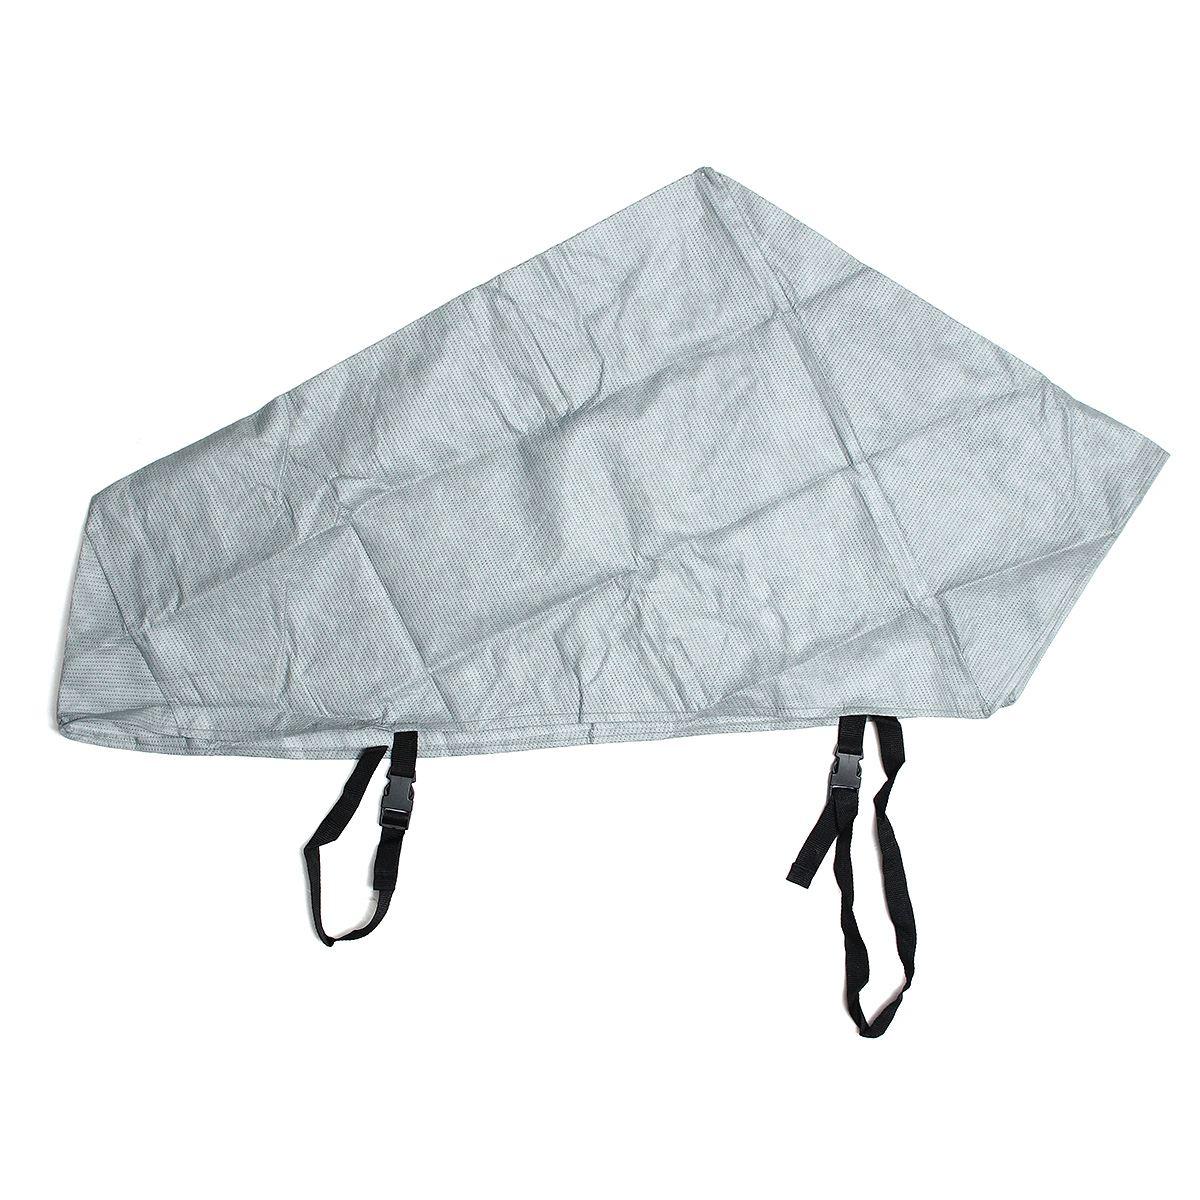 Grey Waterproof Caravan Tailer Towing Hitch Coupling Lock Cover Reflective Coating Material Rain Dust Protect